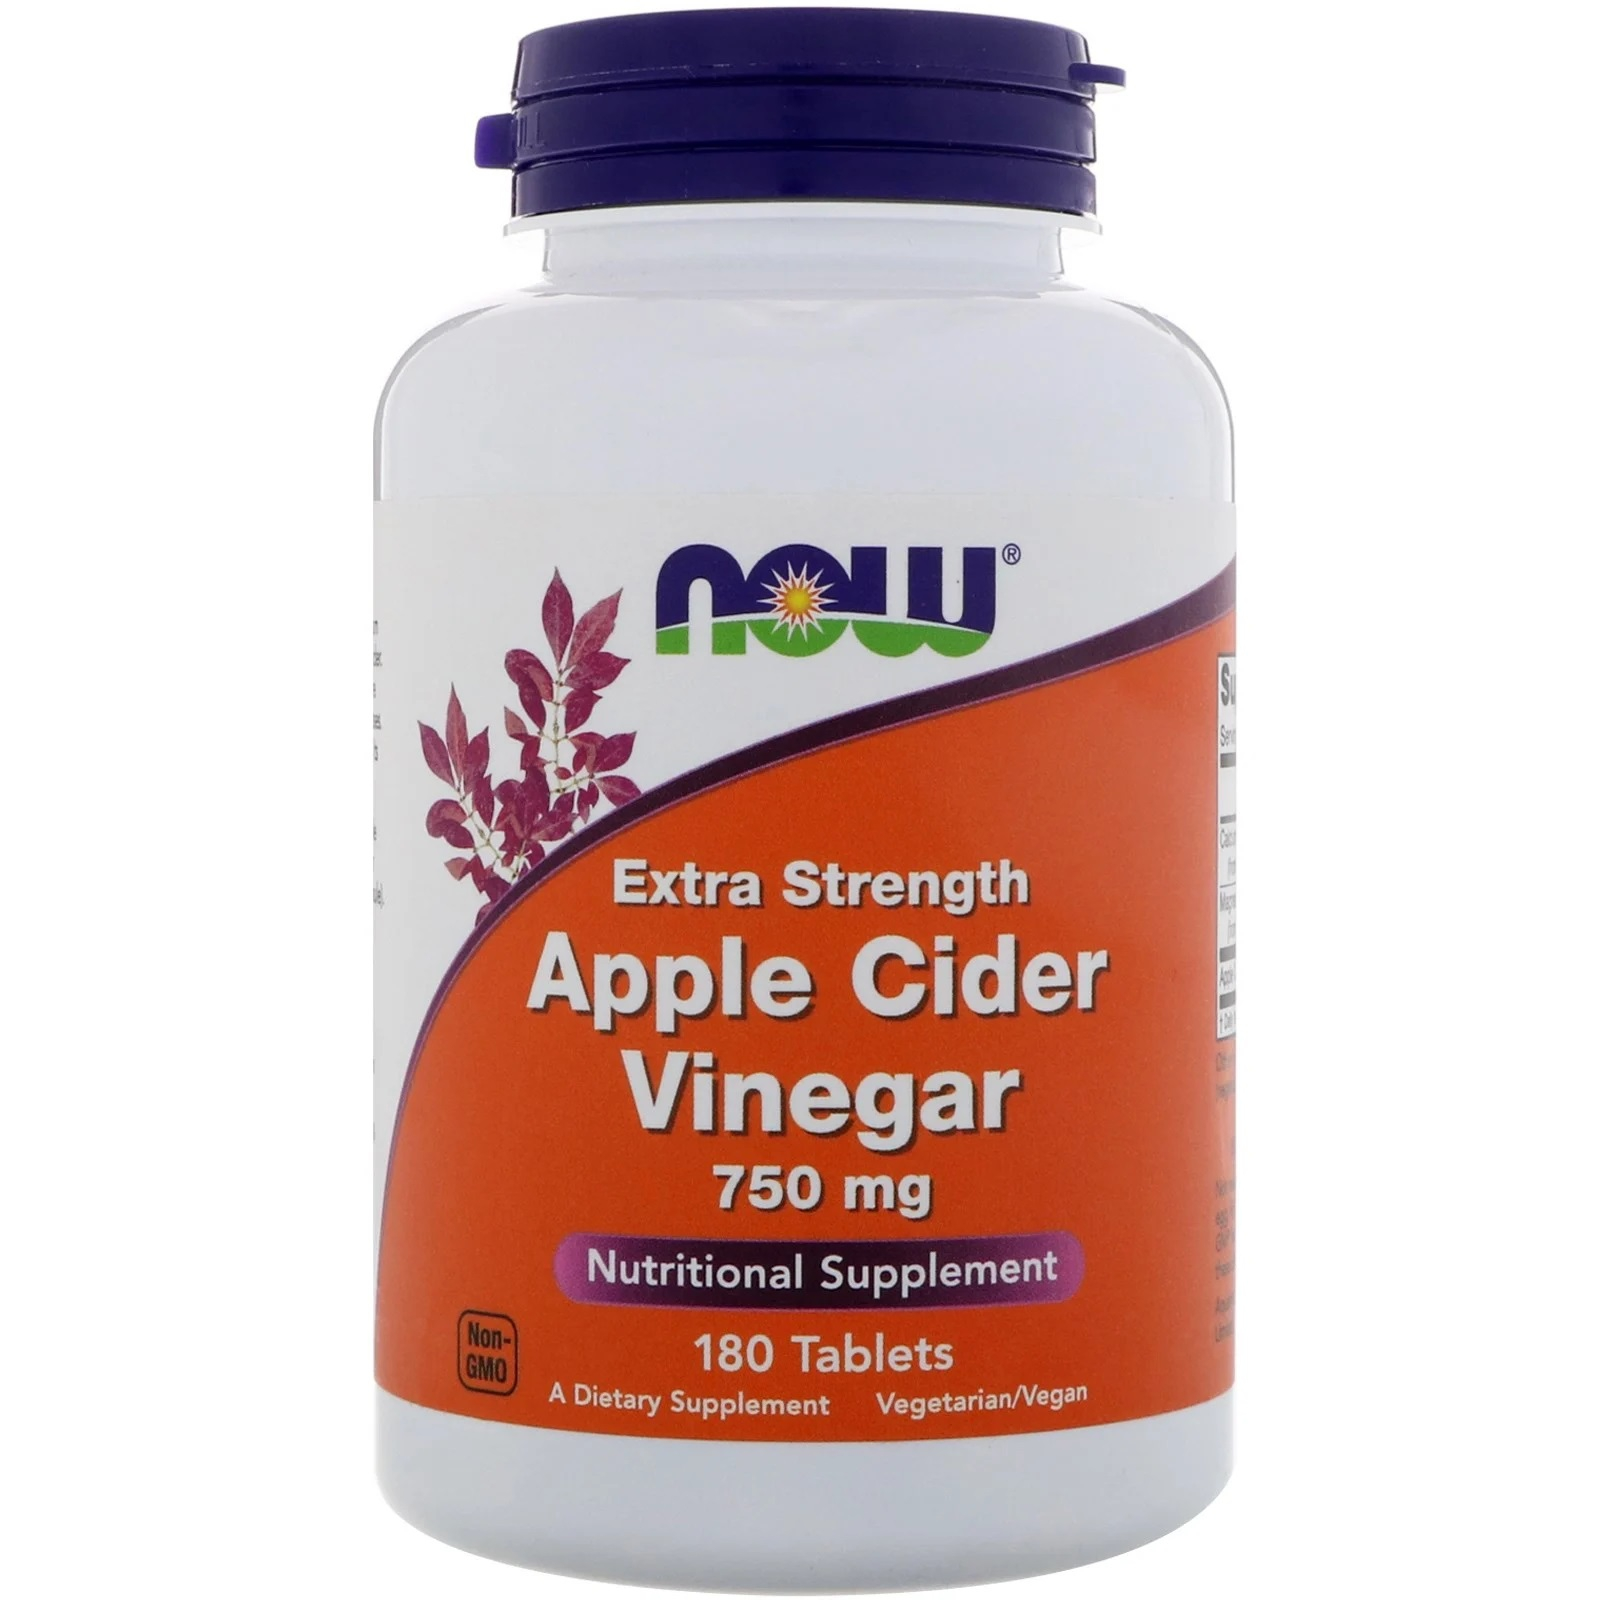 Image of Apple Cider Vinegar- Extra Strength 750 mg (180 tablets) - Now Foods